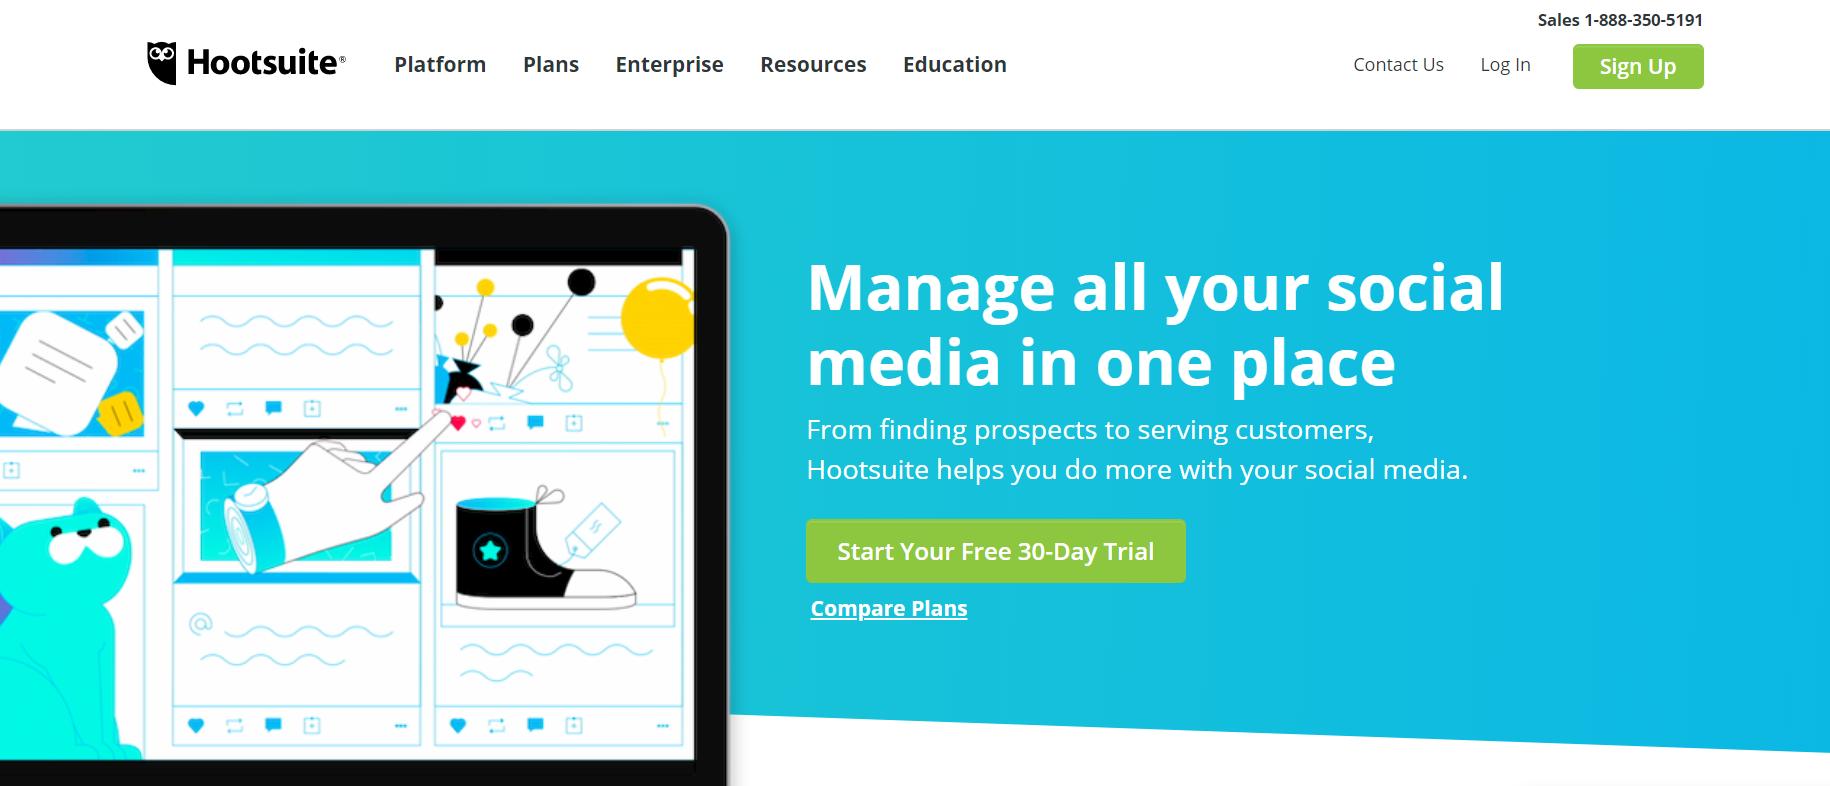 HootSuite_Social_Media